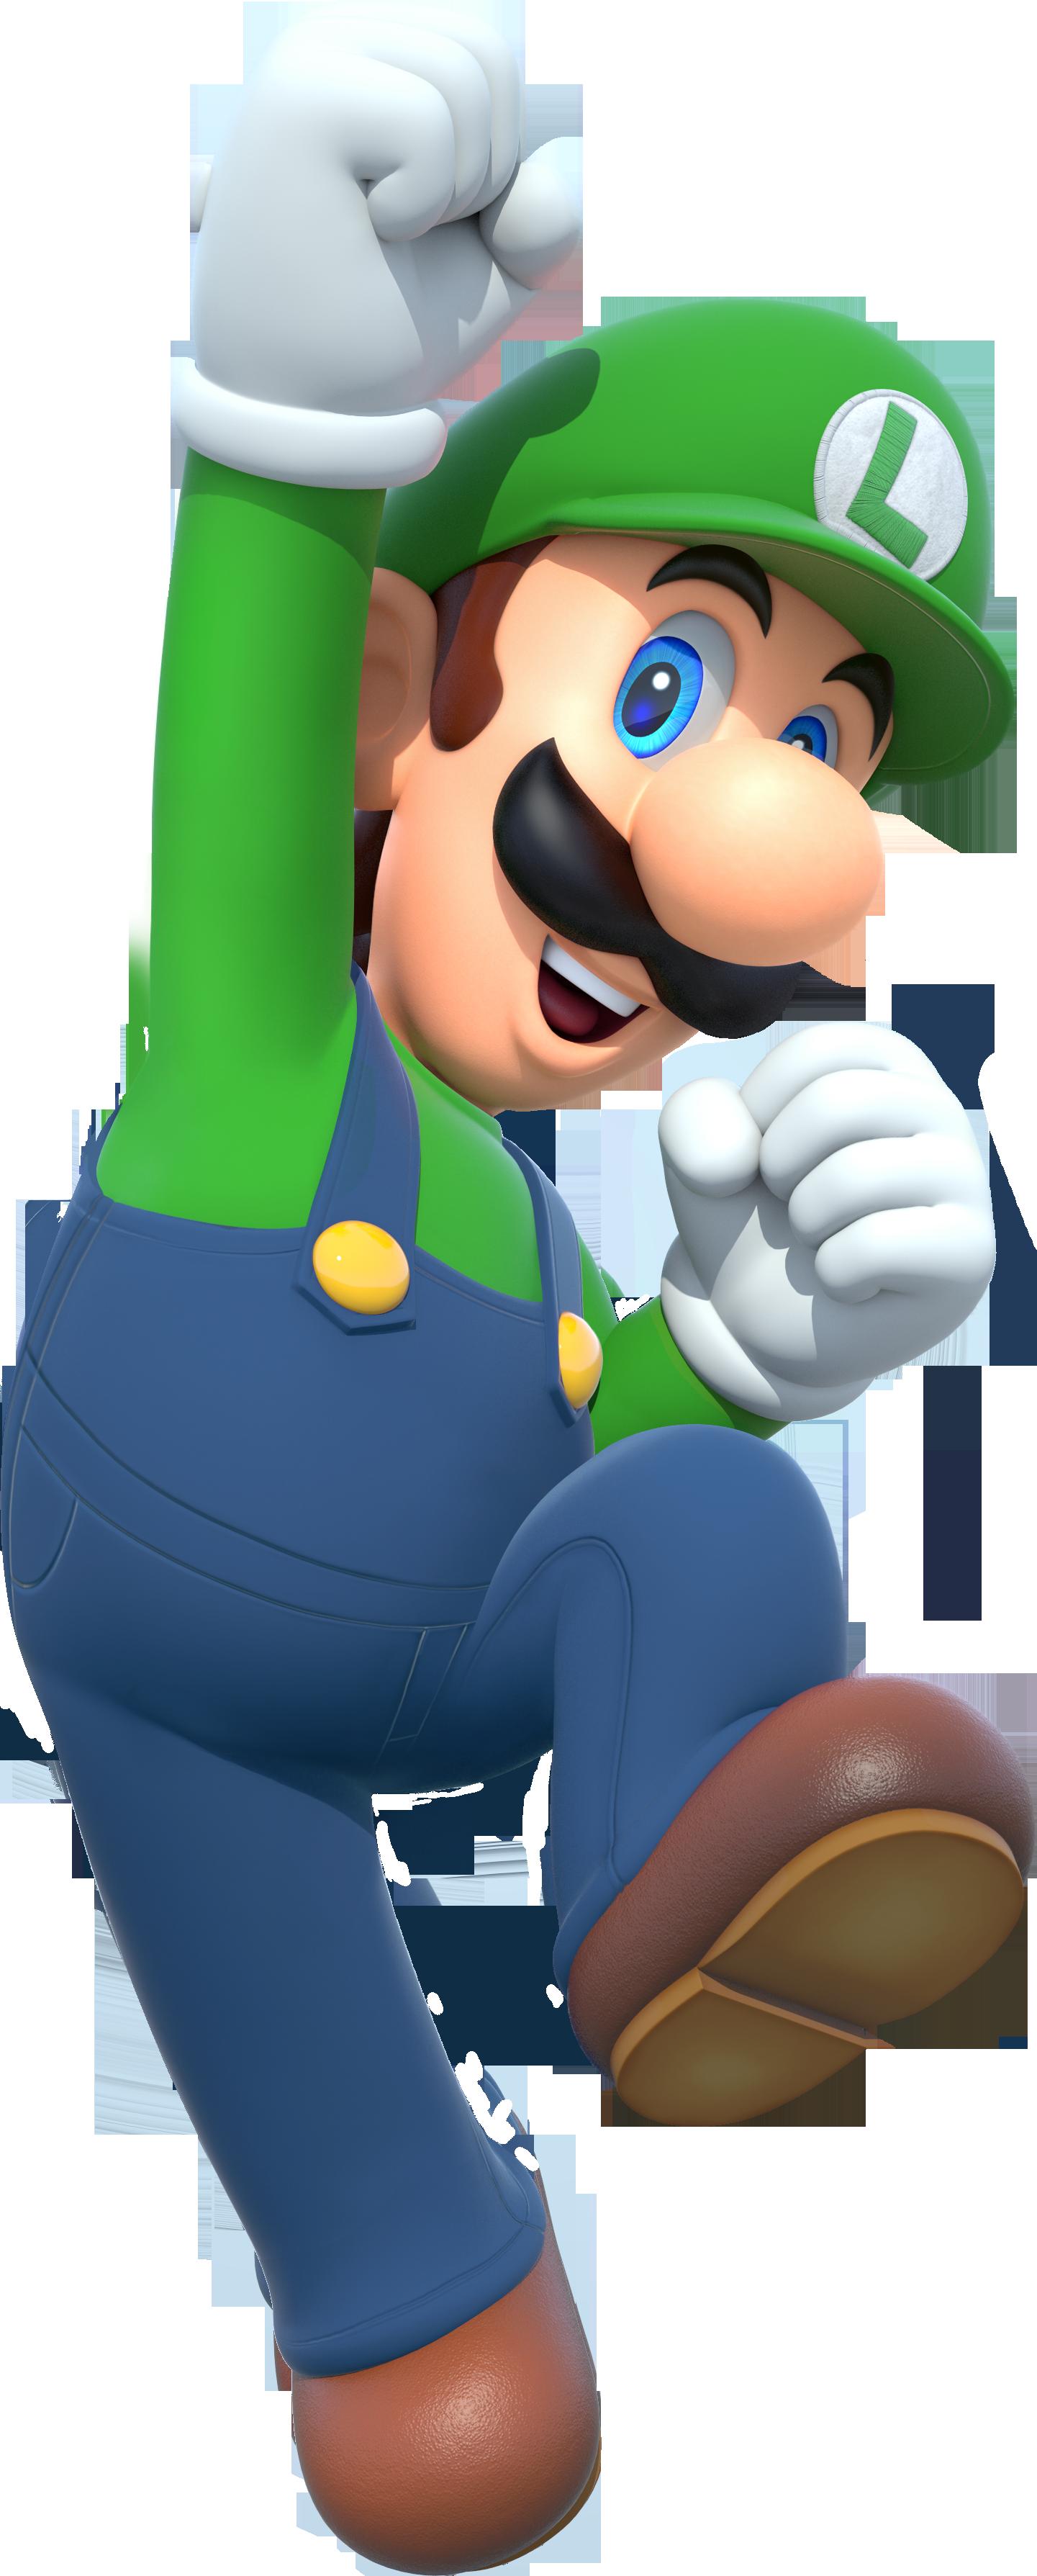 Mario clipart pitcher. Luigi sonic news network